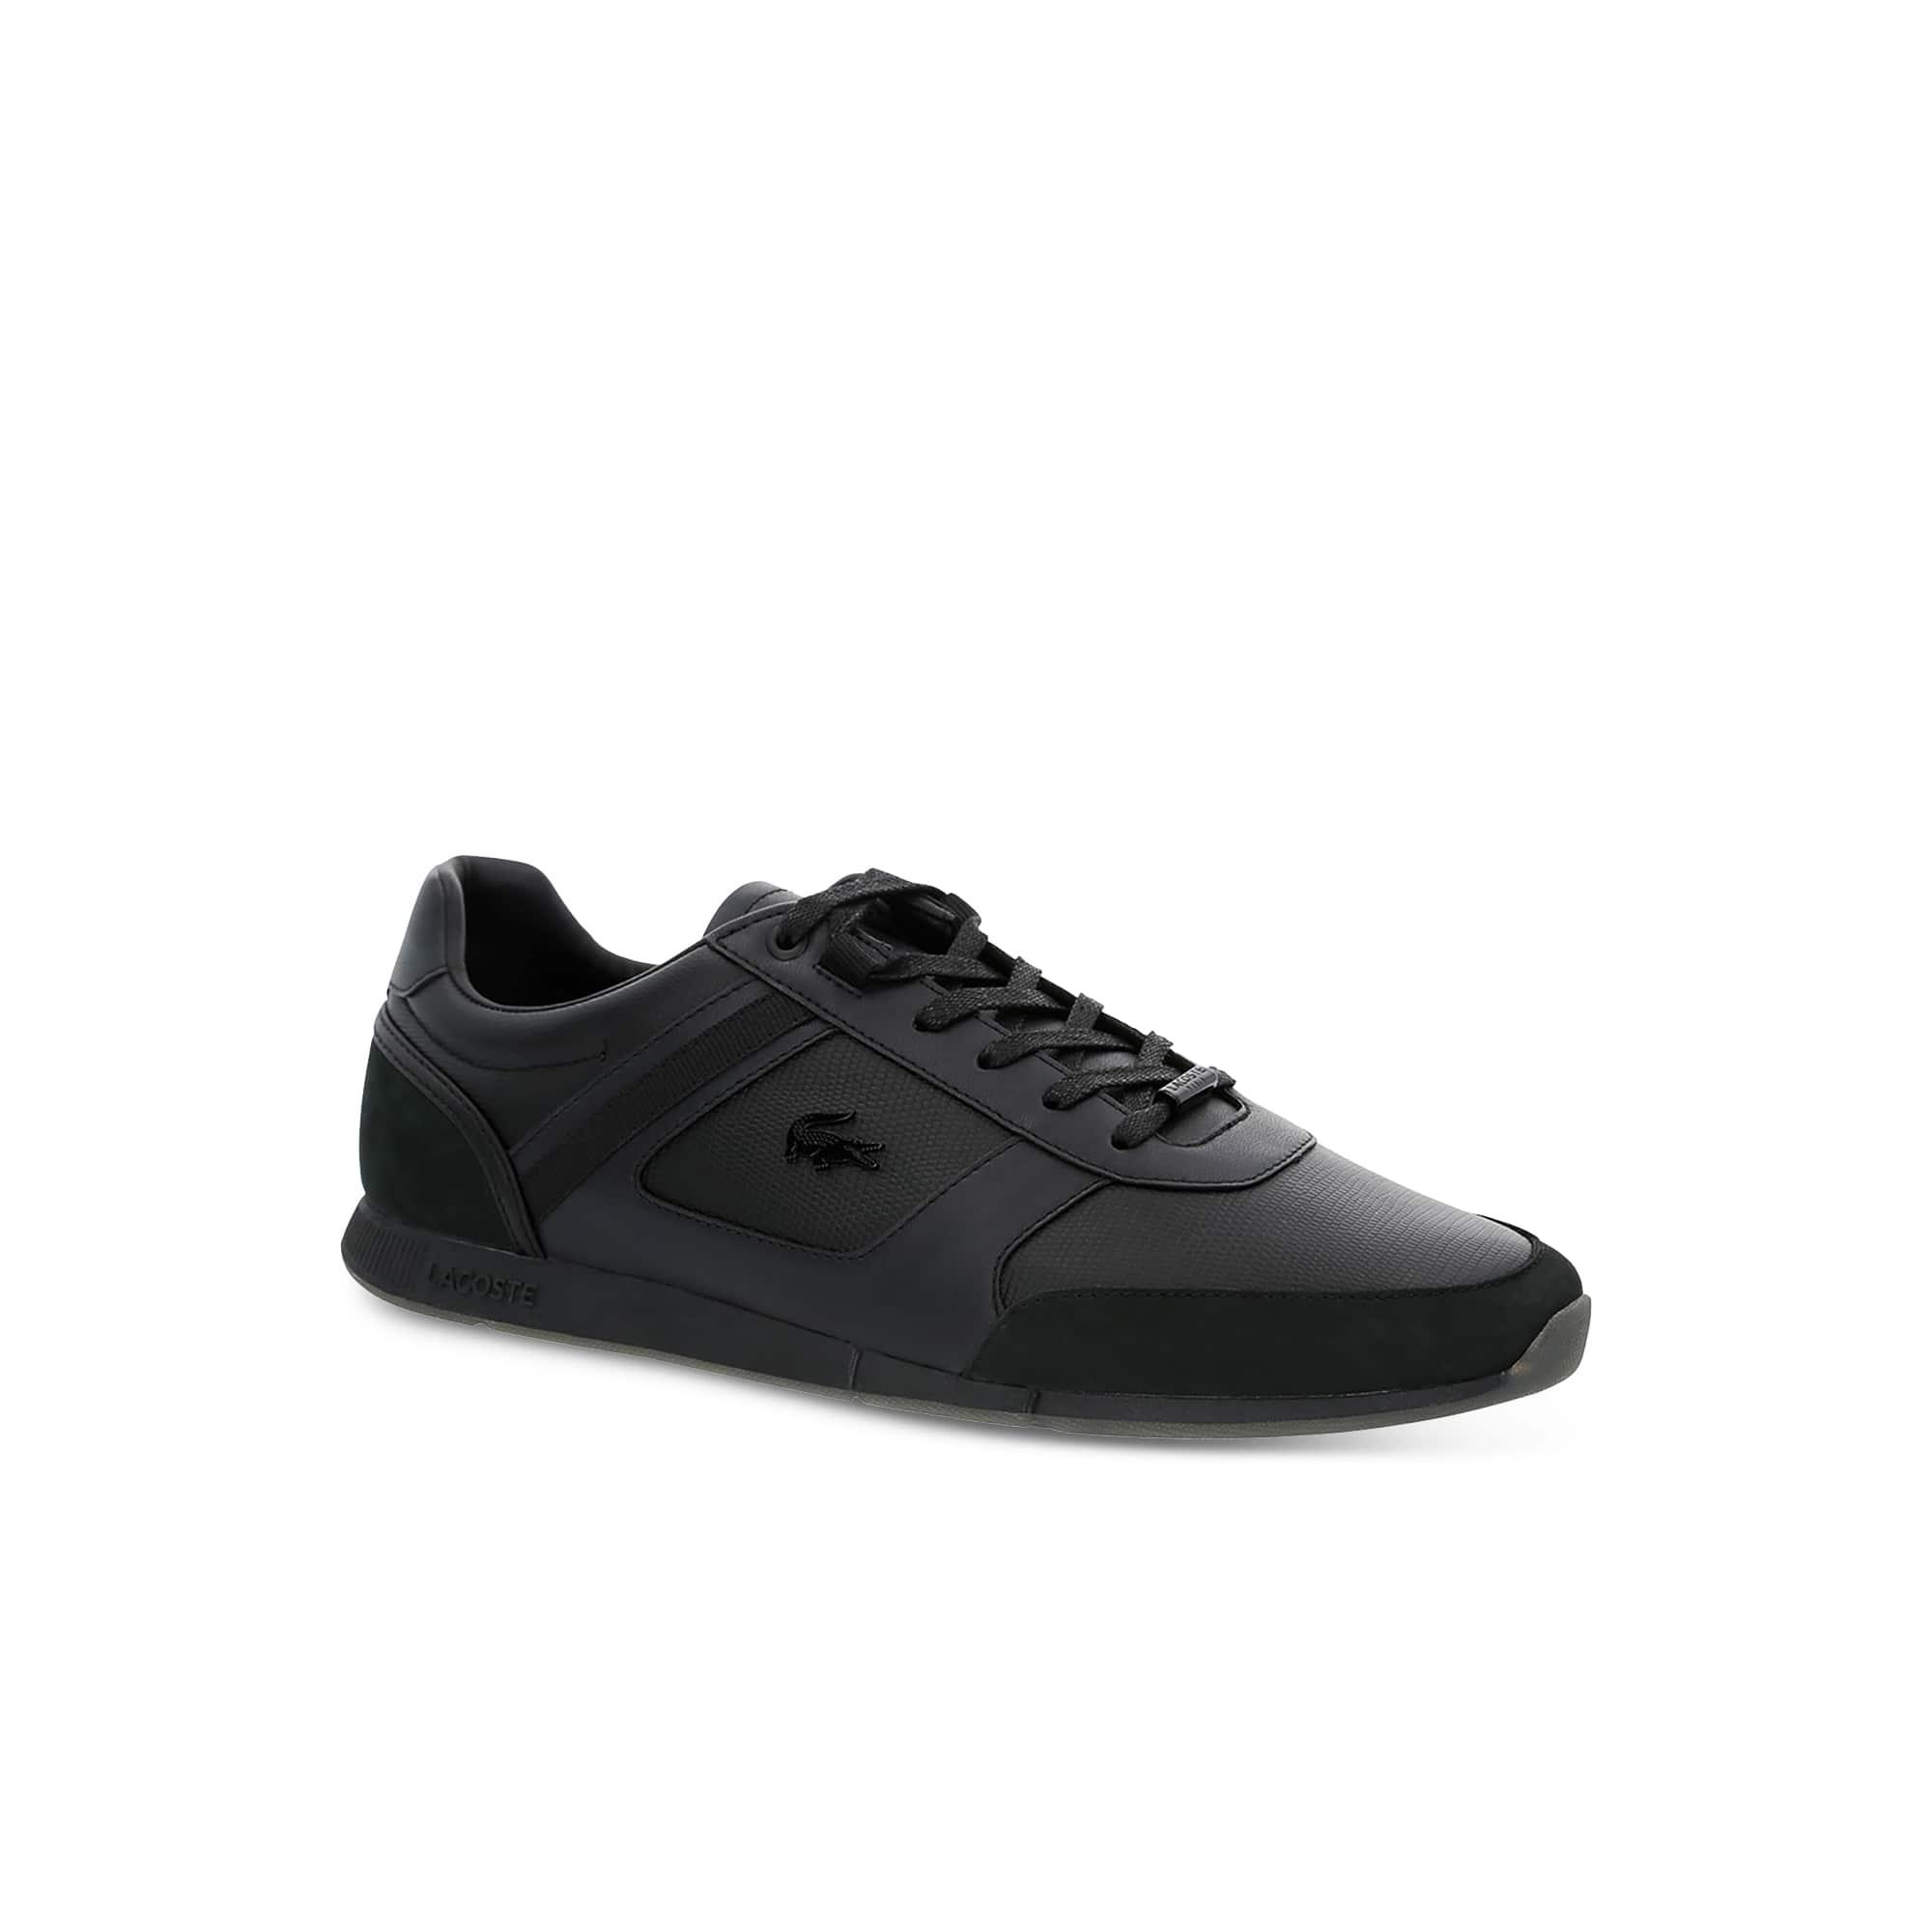 a2f20ff3053 Men s Menerva Leather Sneakers